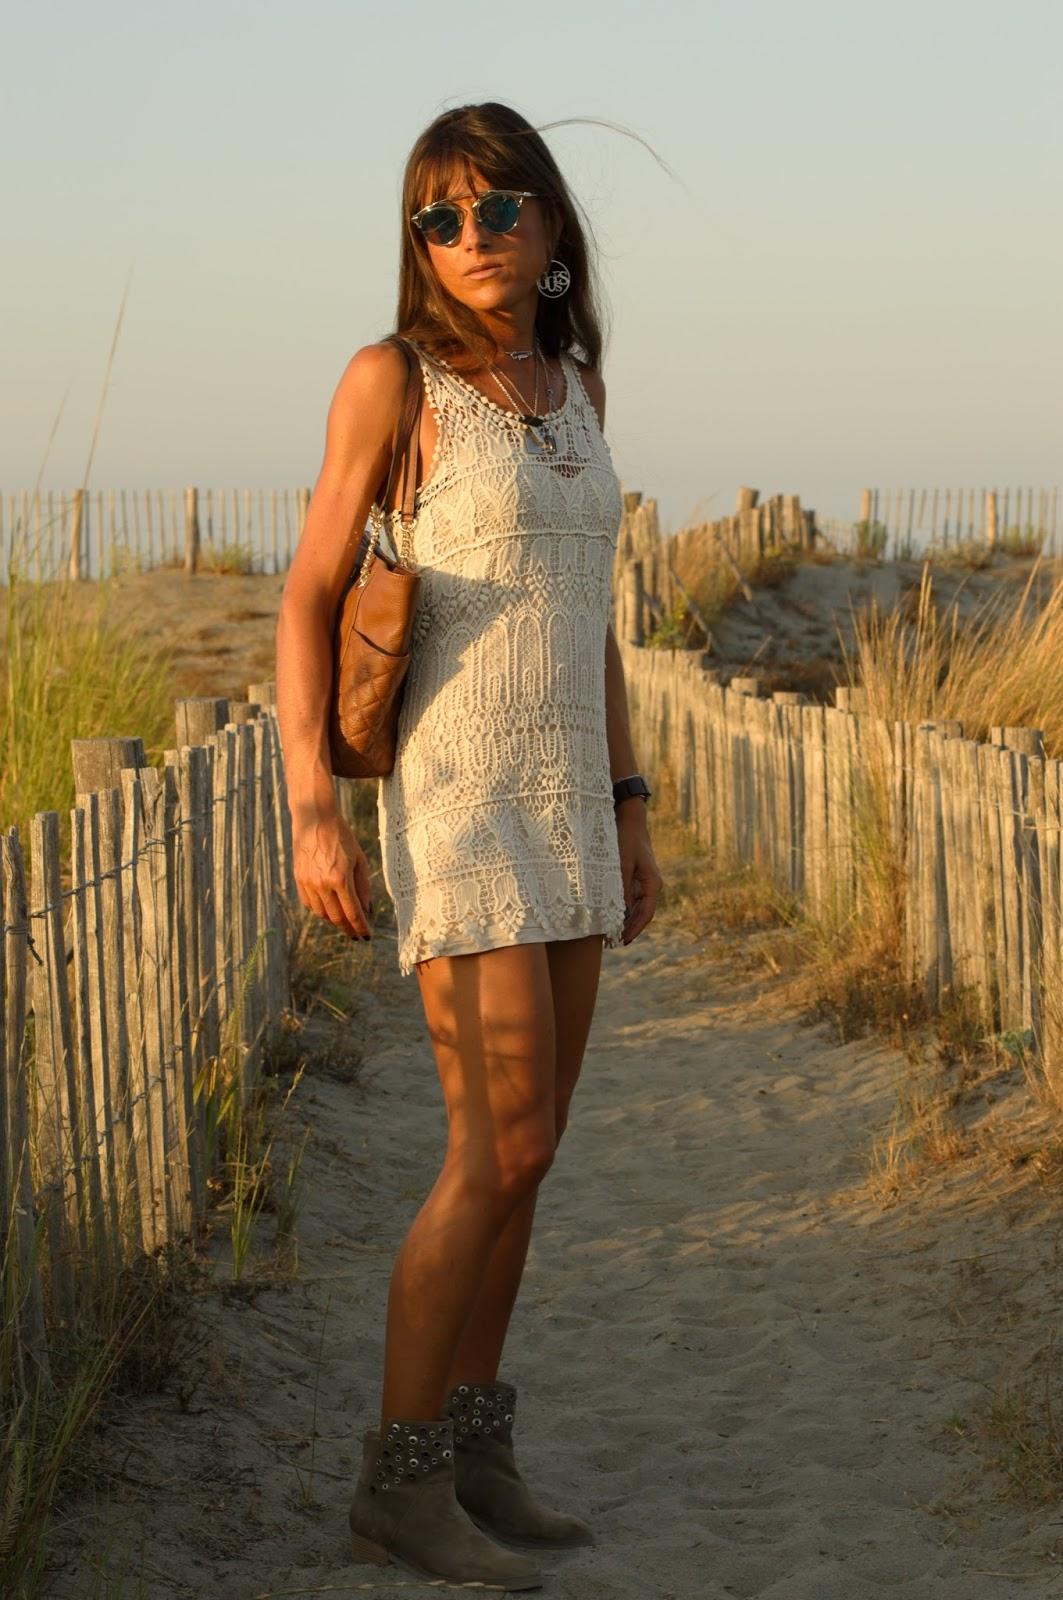 Fashion Musings Diary Crochet Dress Episode 2 My Back To School Beach Look Robe Crochet Episode 2 Mon Look De Rentree Au Parfum De Plage